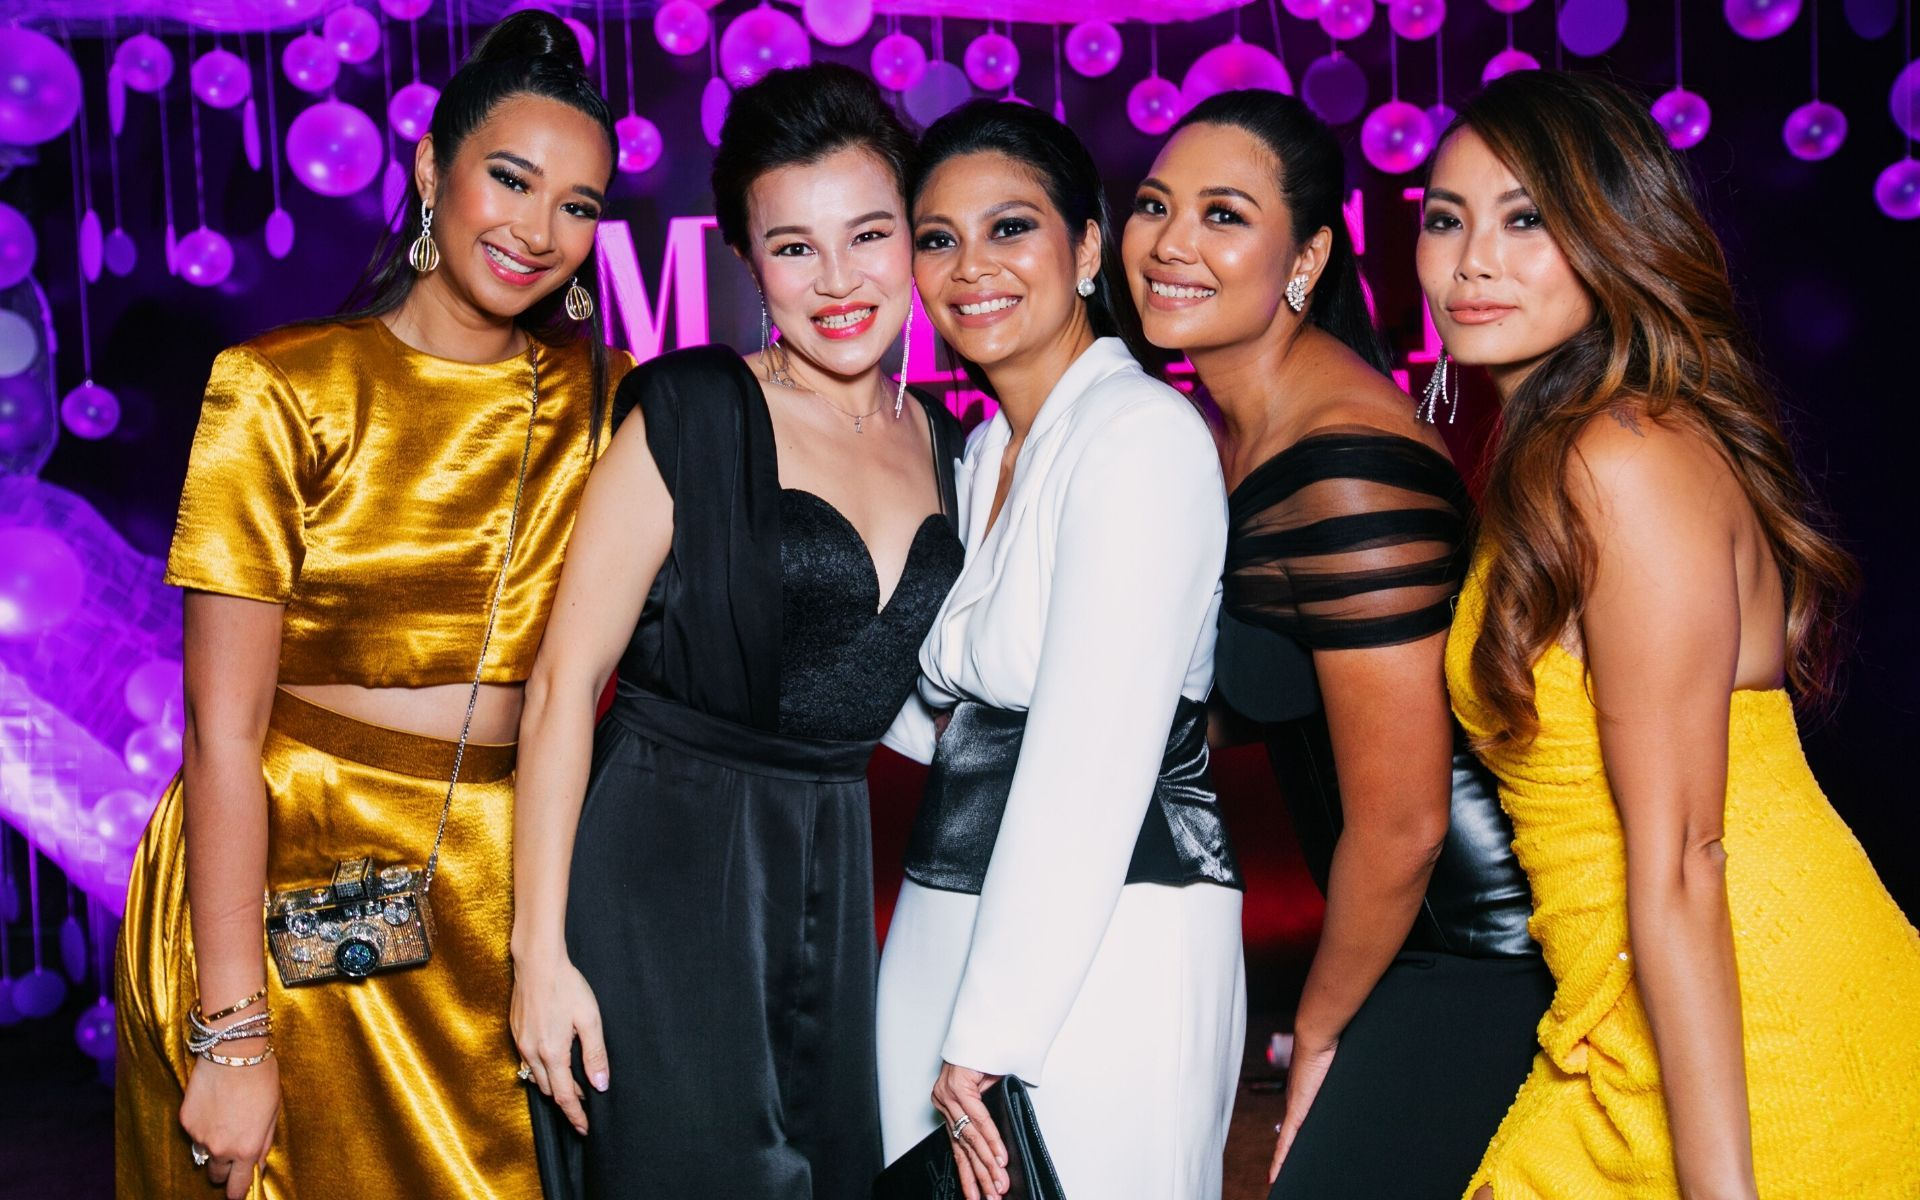 Ally Mukhriz, Melissa Sim, Zaireen Ibrahim, Zaida Ibrahim and Ung Yiu Lin at Malaysia Tatler Ball 2019